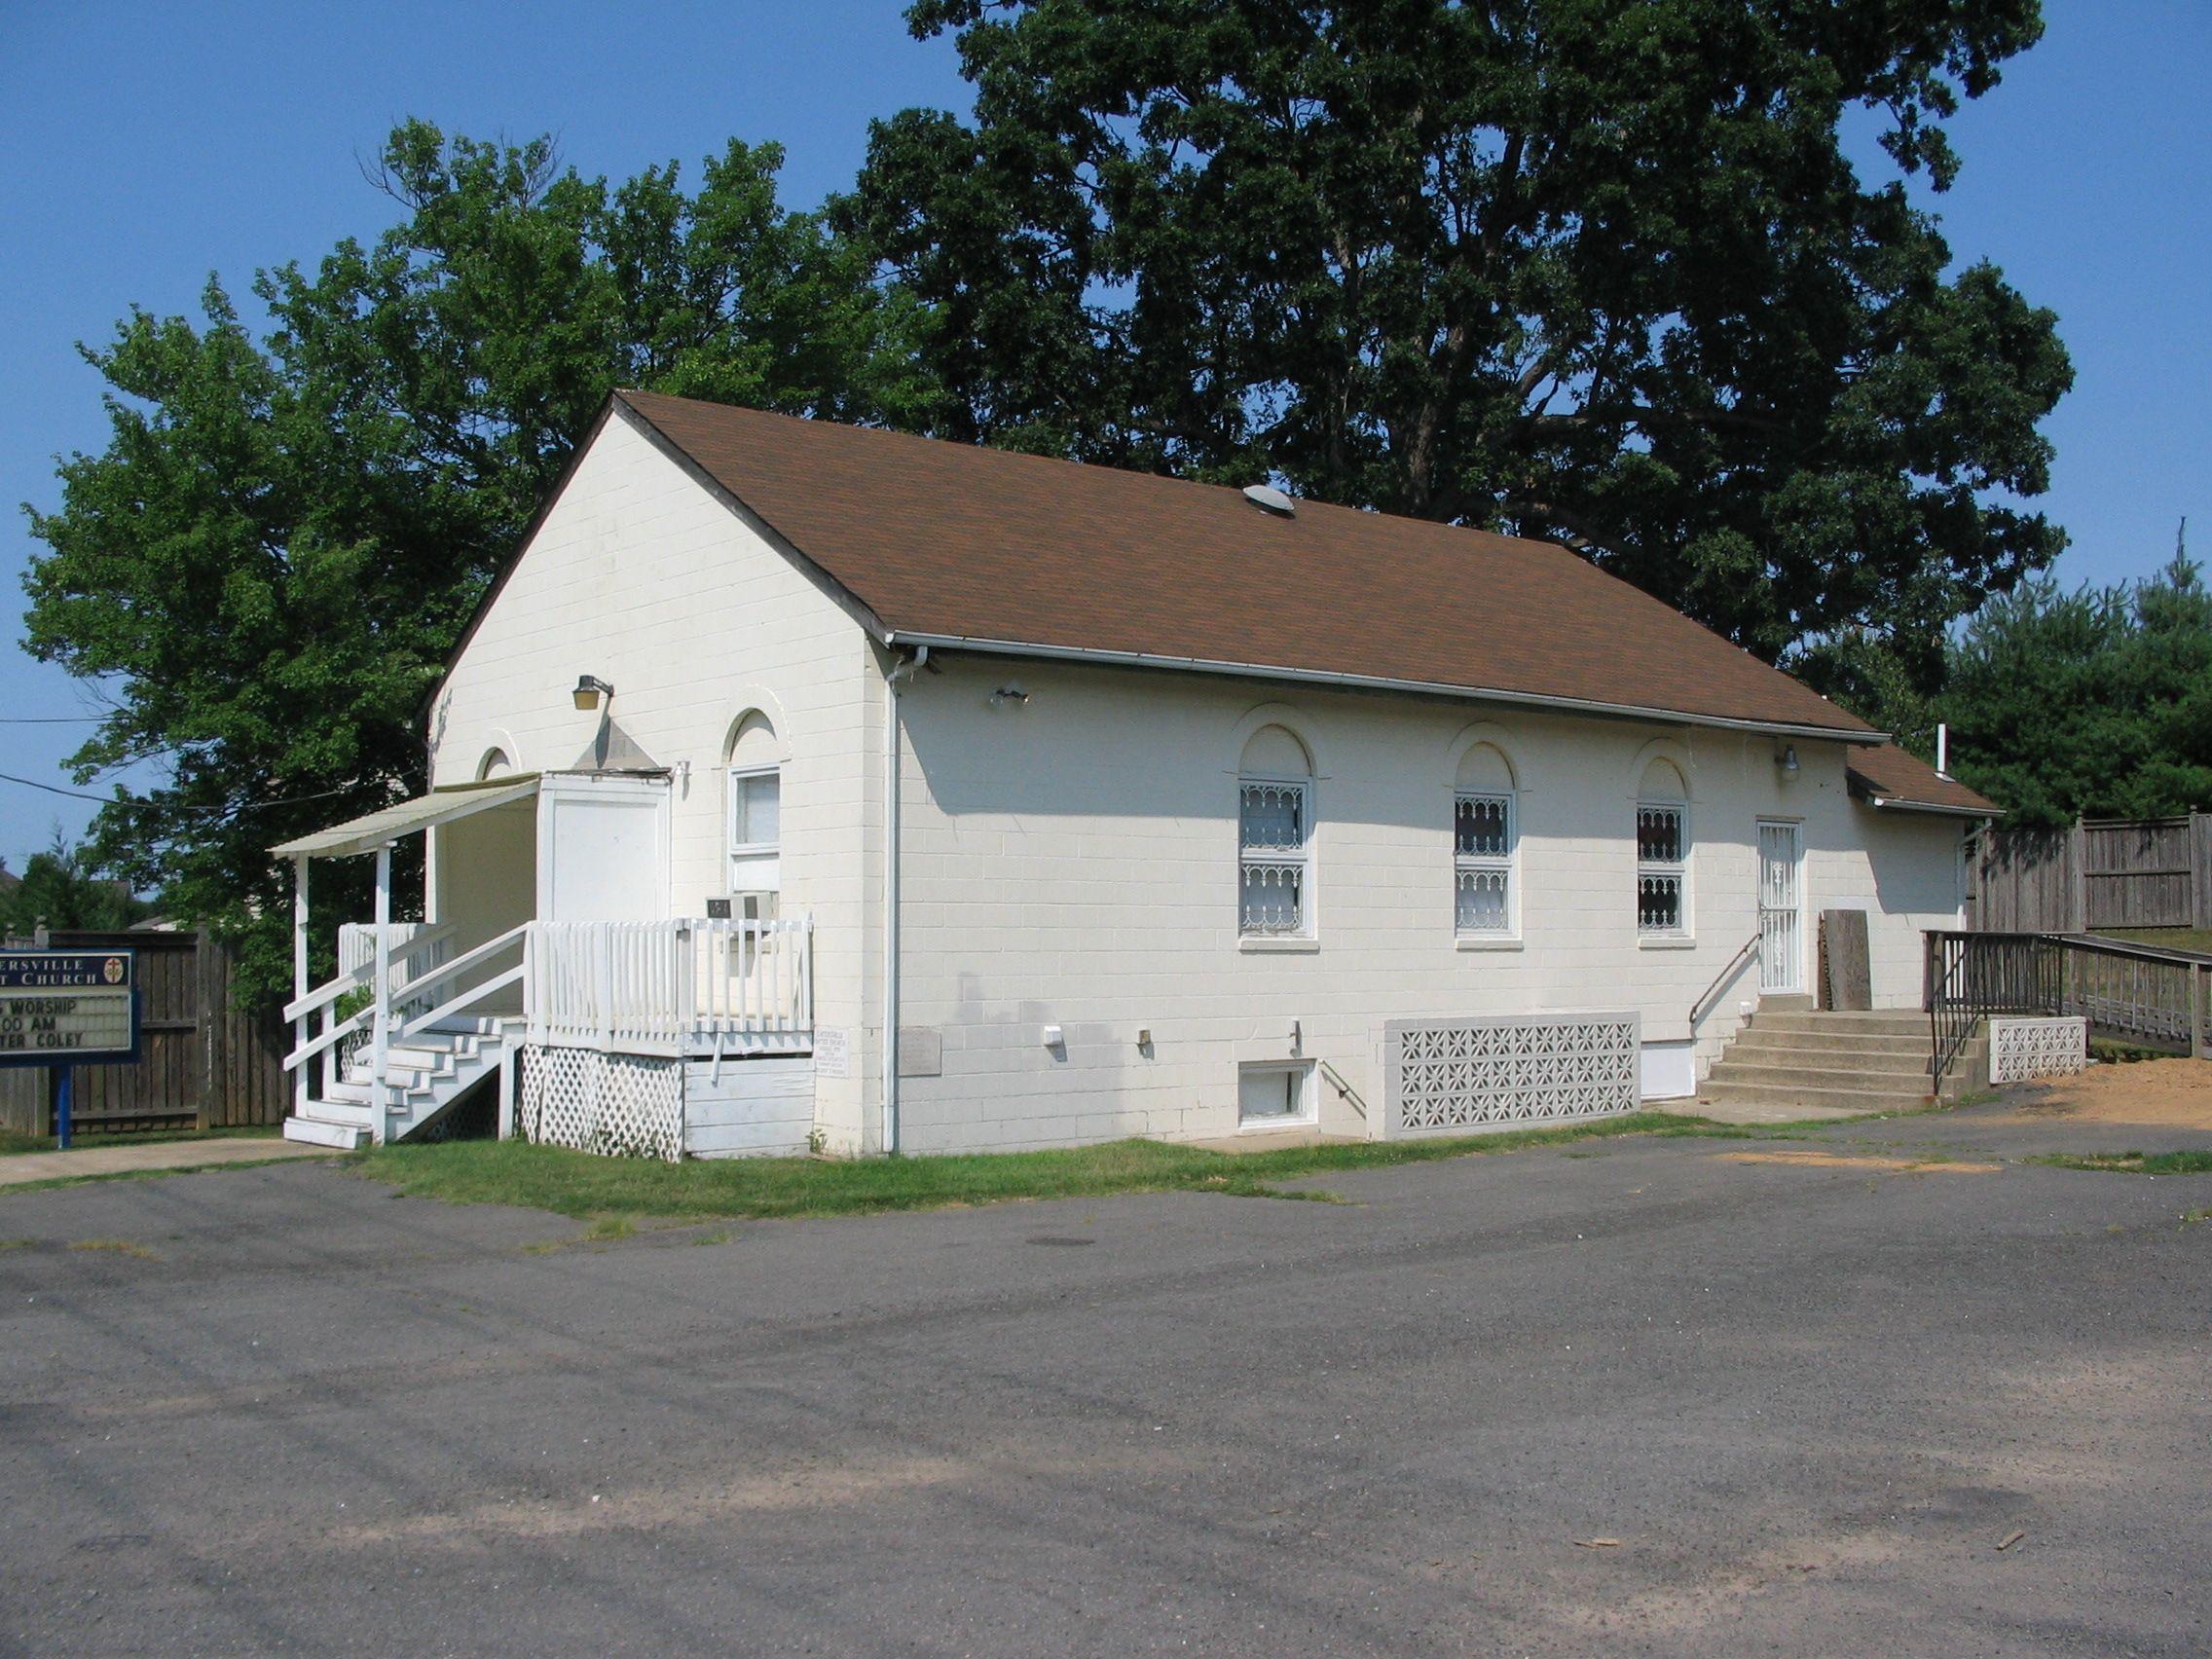 Cartersville Baptist Church, by Craig Swain on hmdb.org